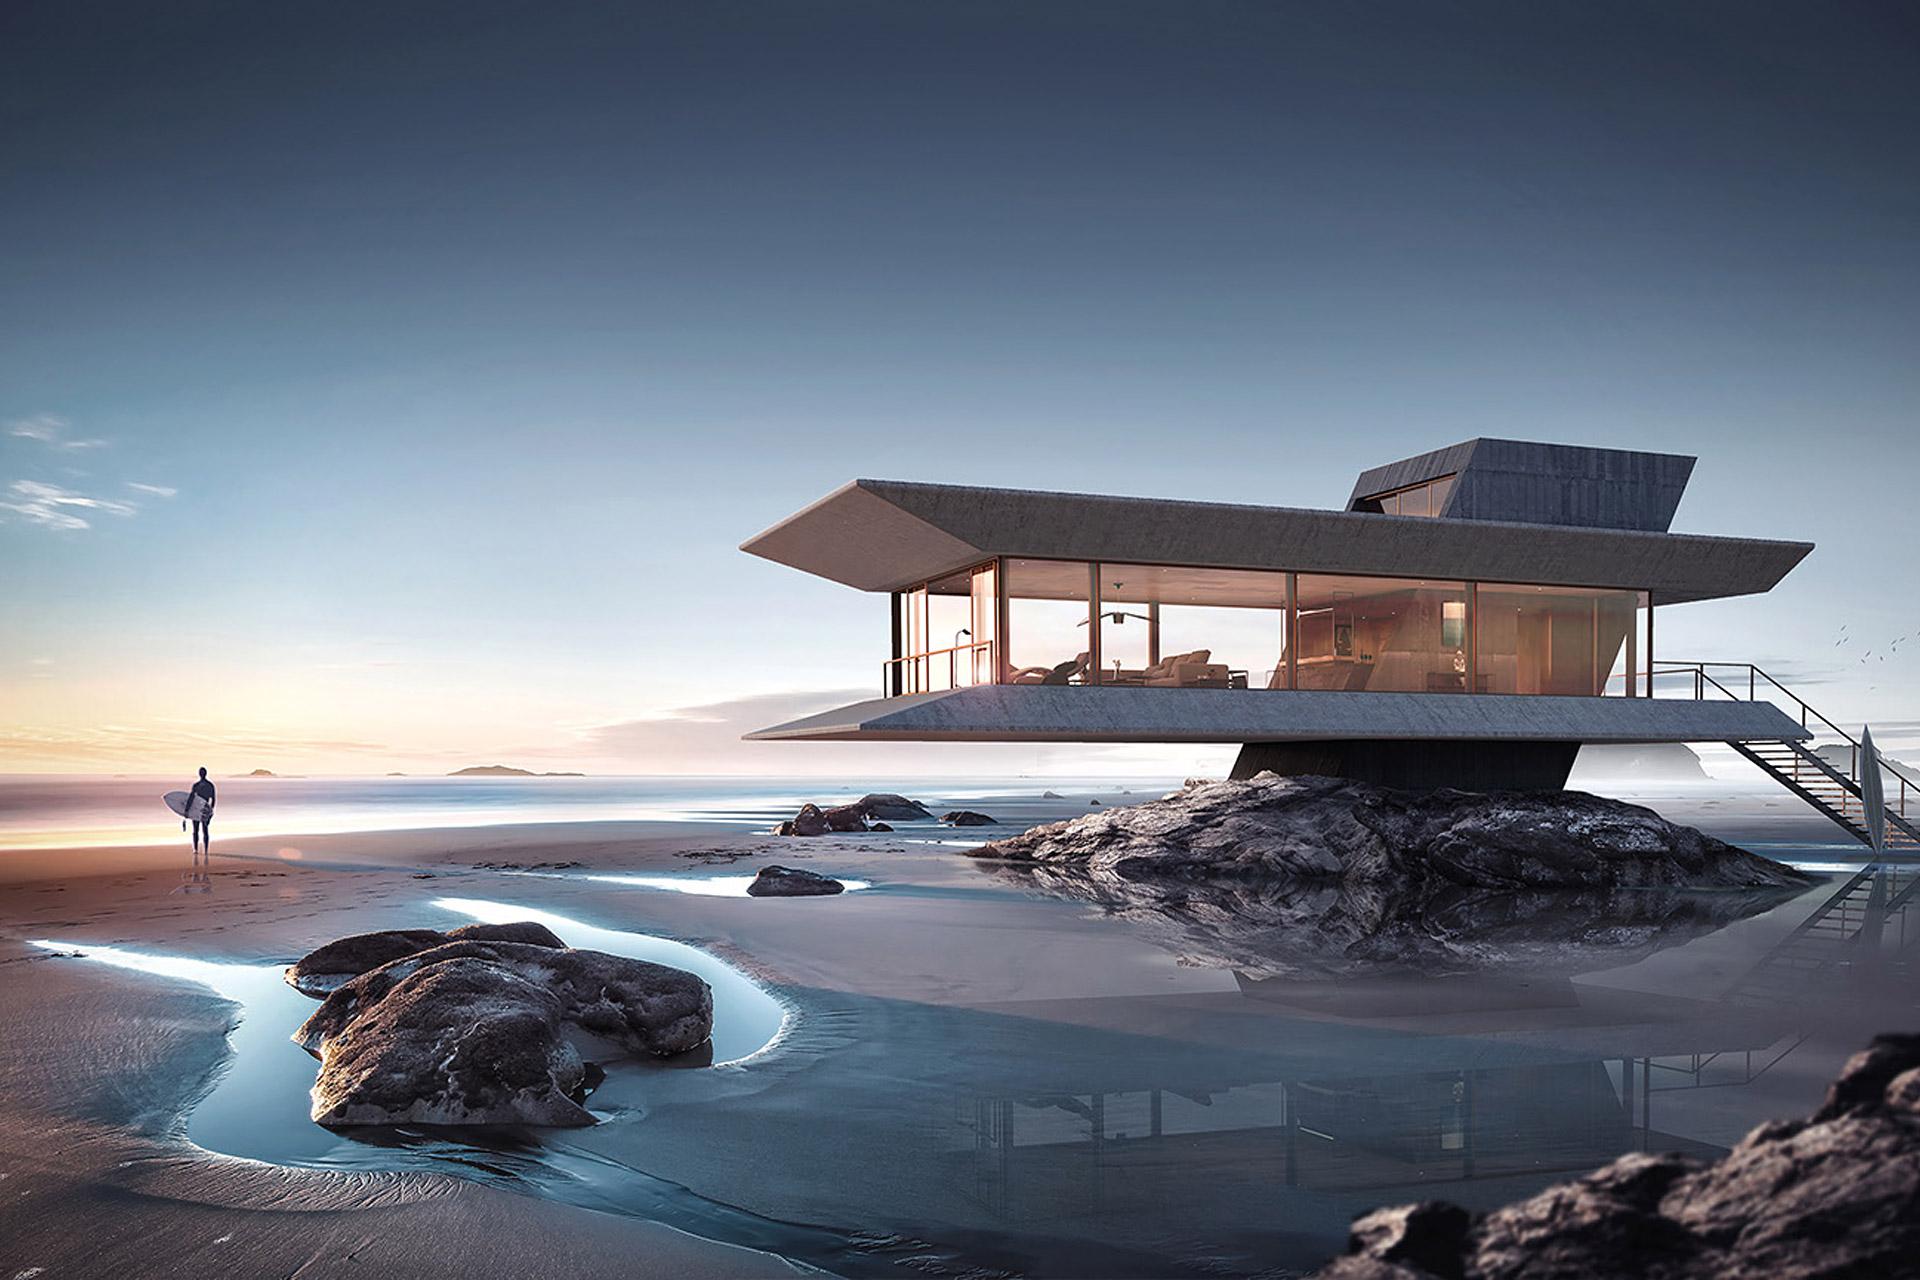 Monolit Beach House